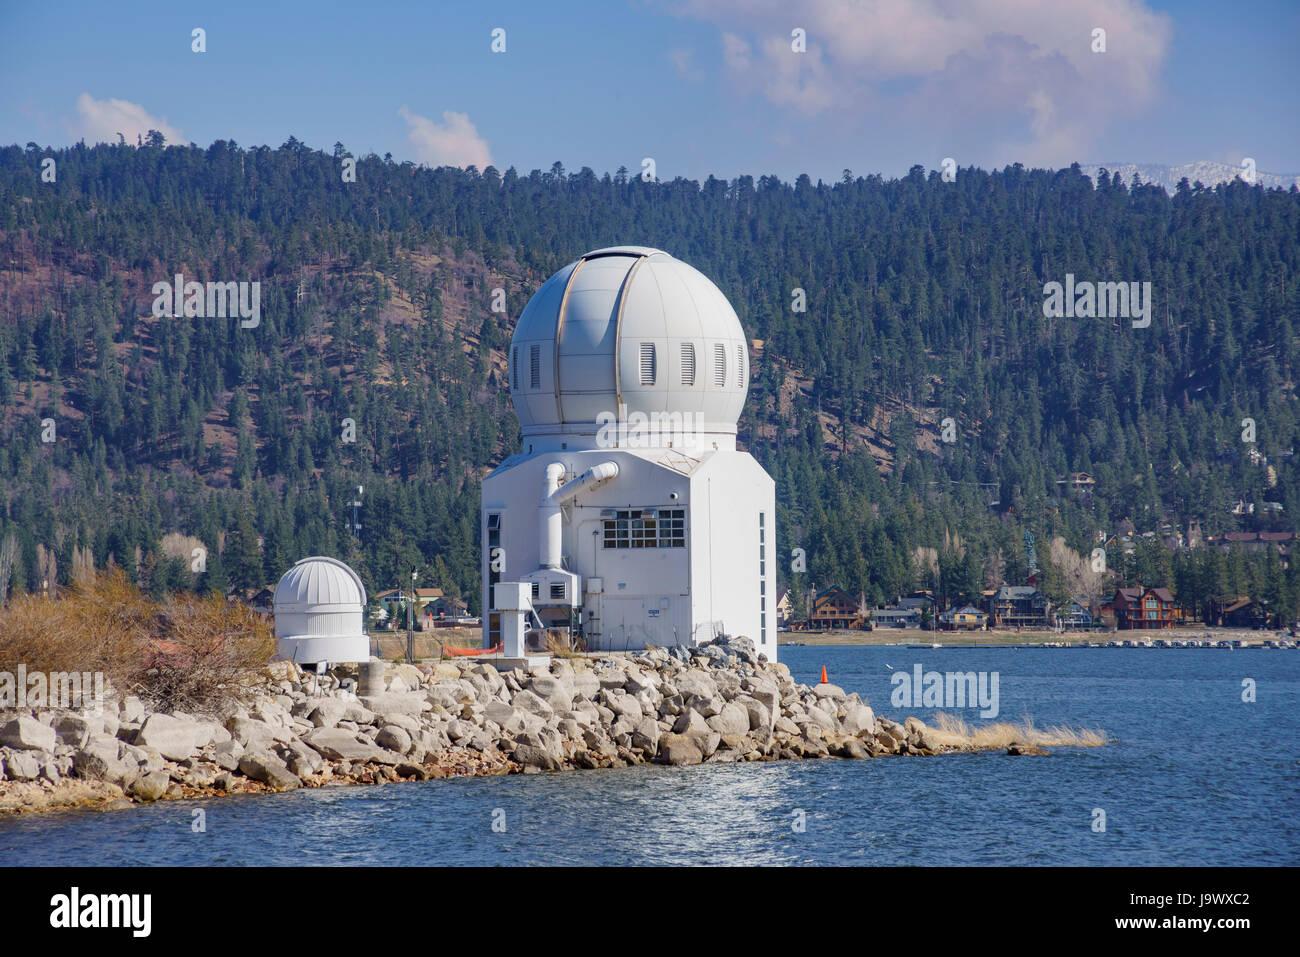 Topic univers spacial  - Page 7 Big-bear-solar-observatory-de-la-belle-big-bear-lake-comte-de-los-angeles-californie-j9wxc2